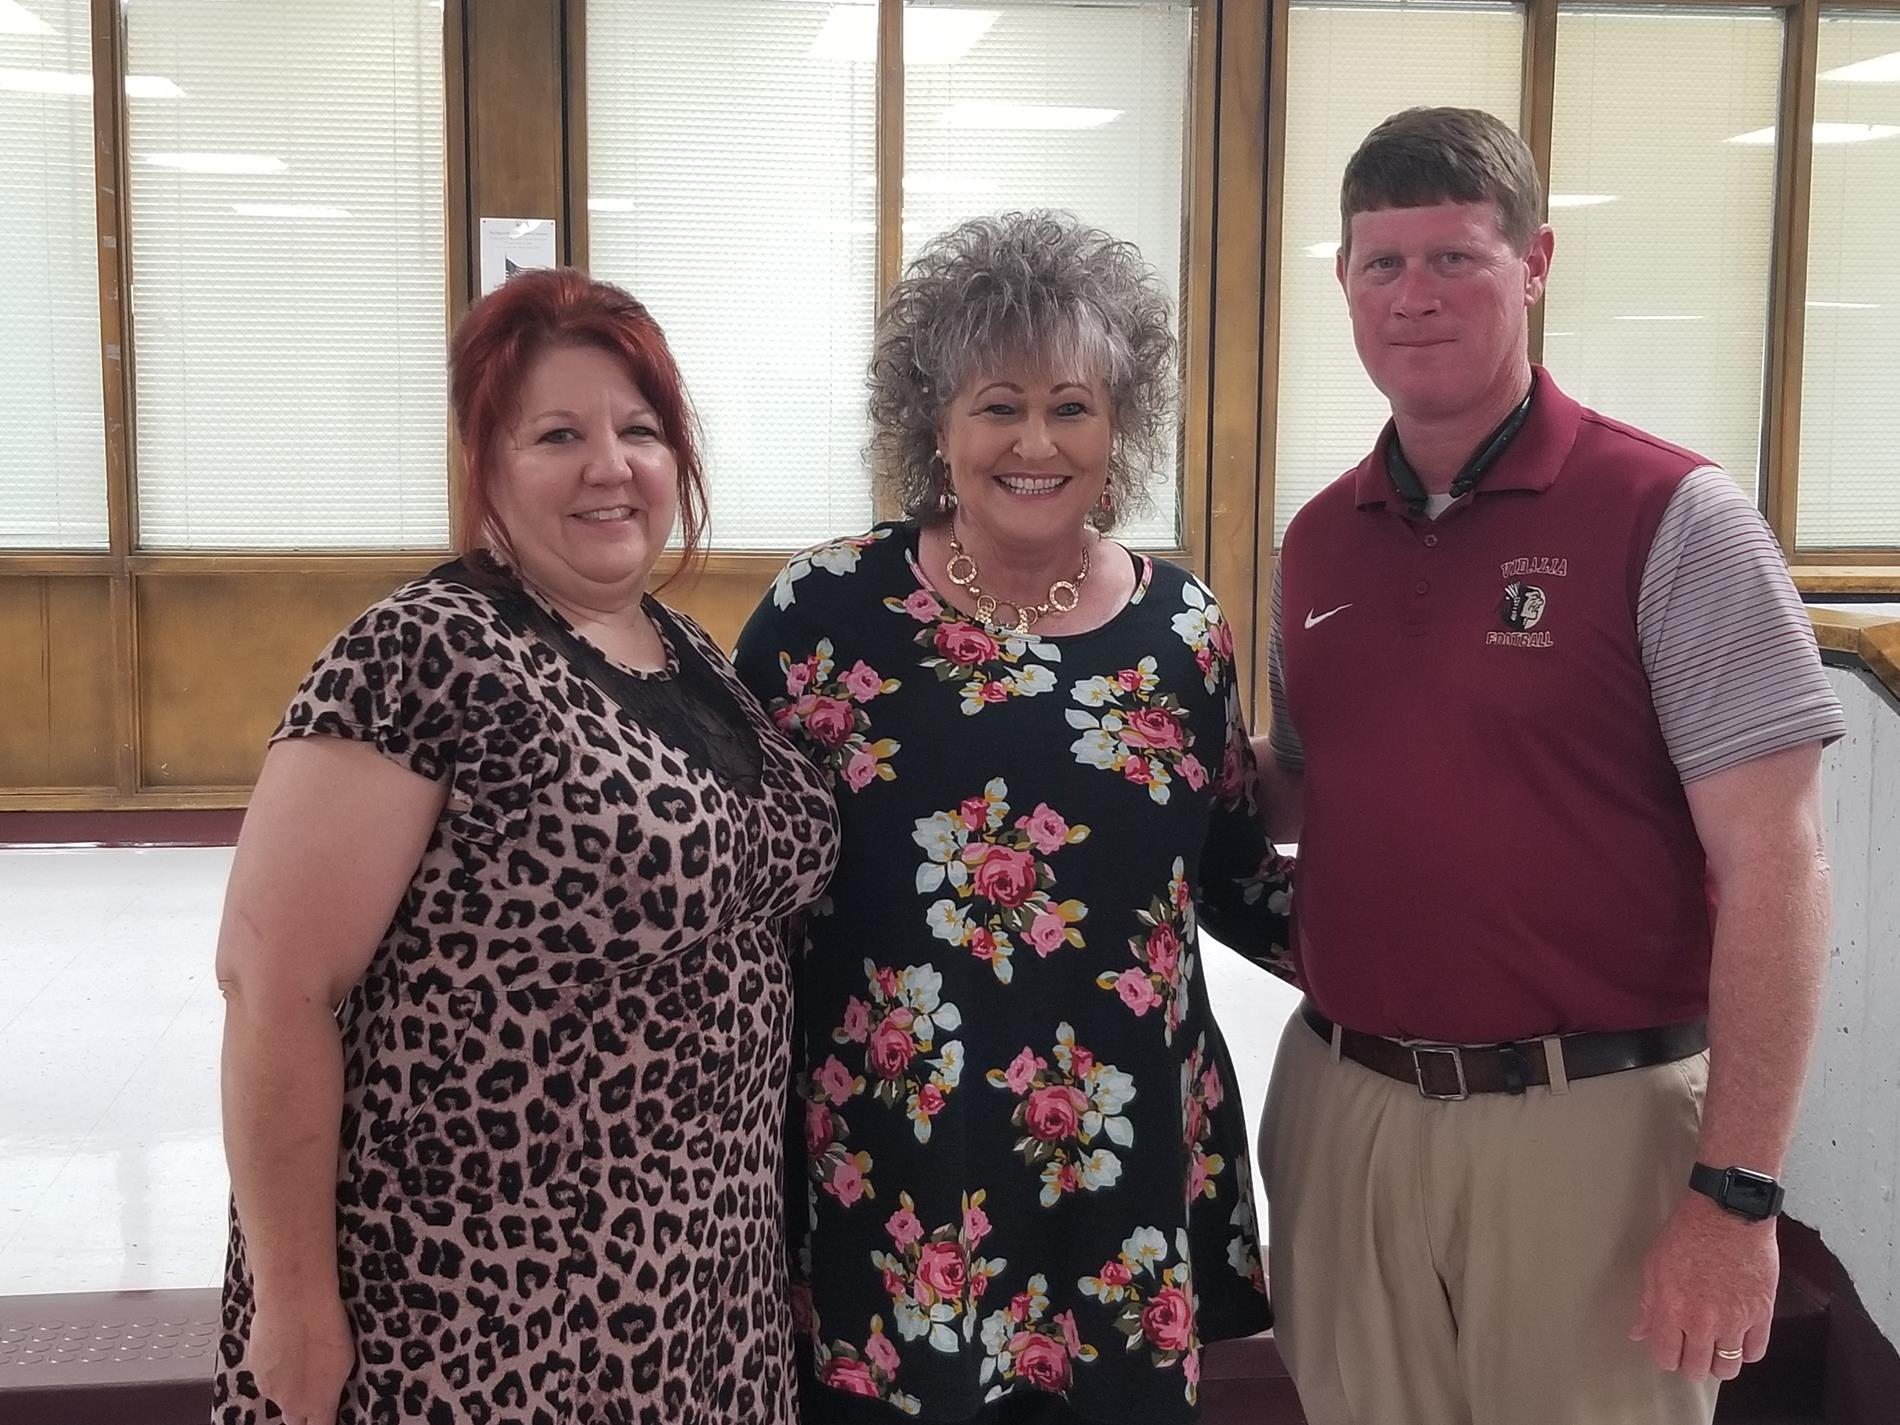 Norma Croft, Seidling & Dr. Garrett Wilcox